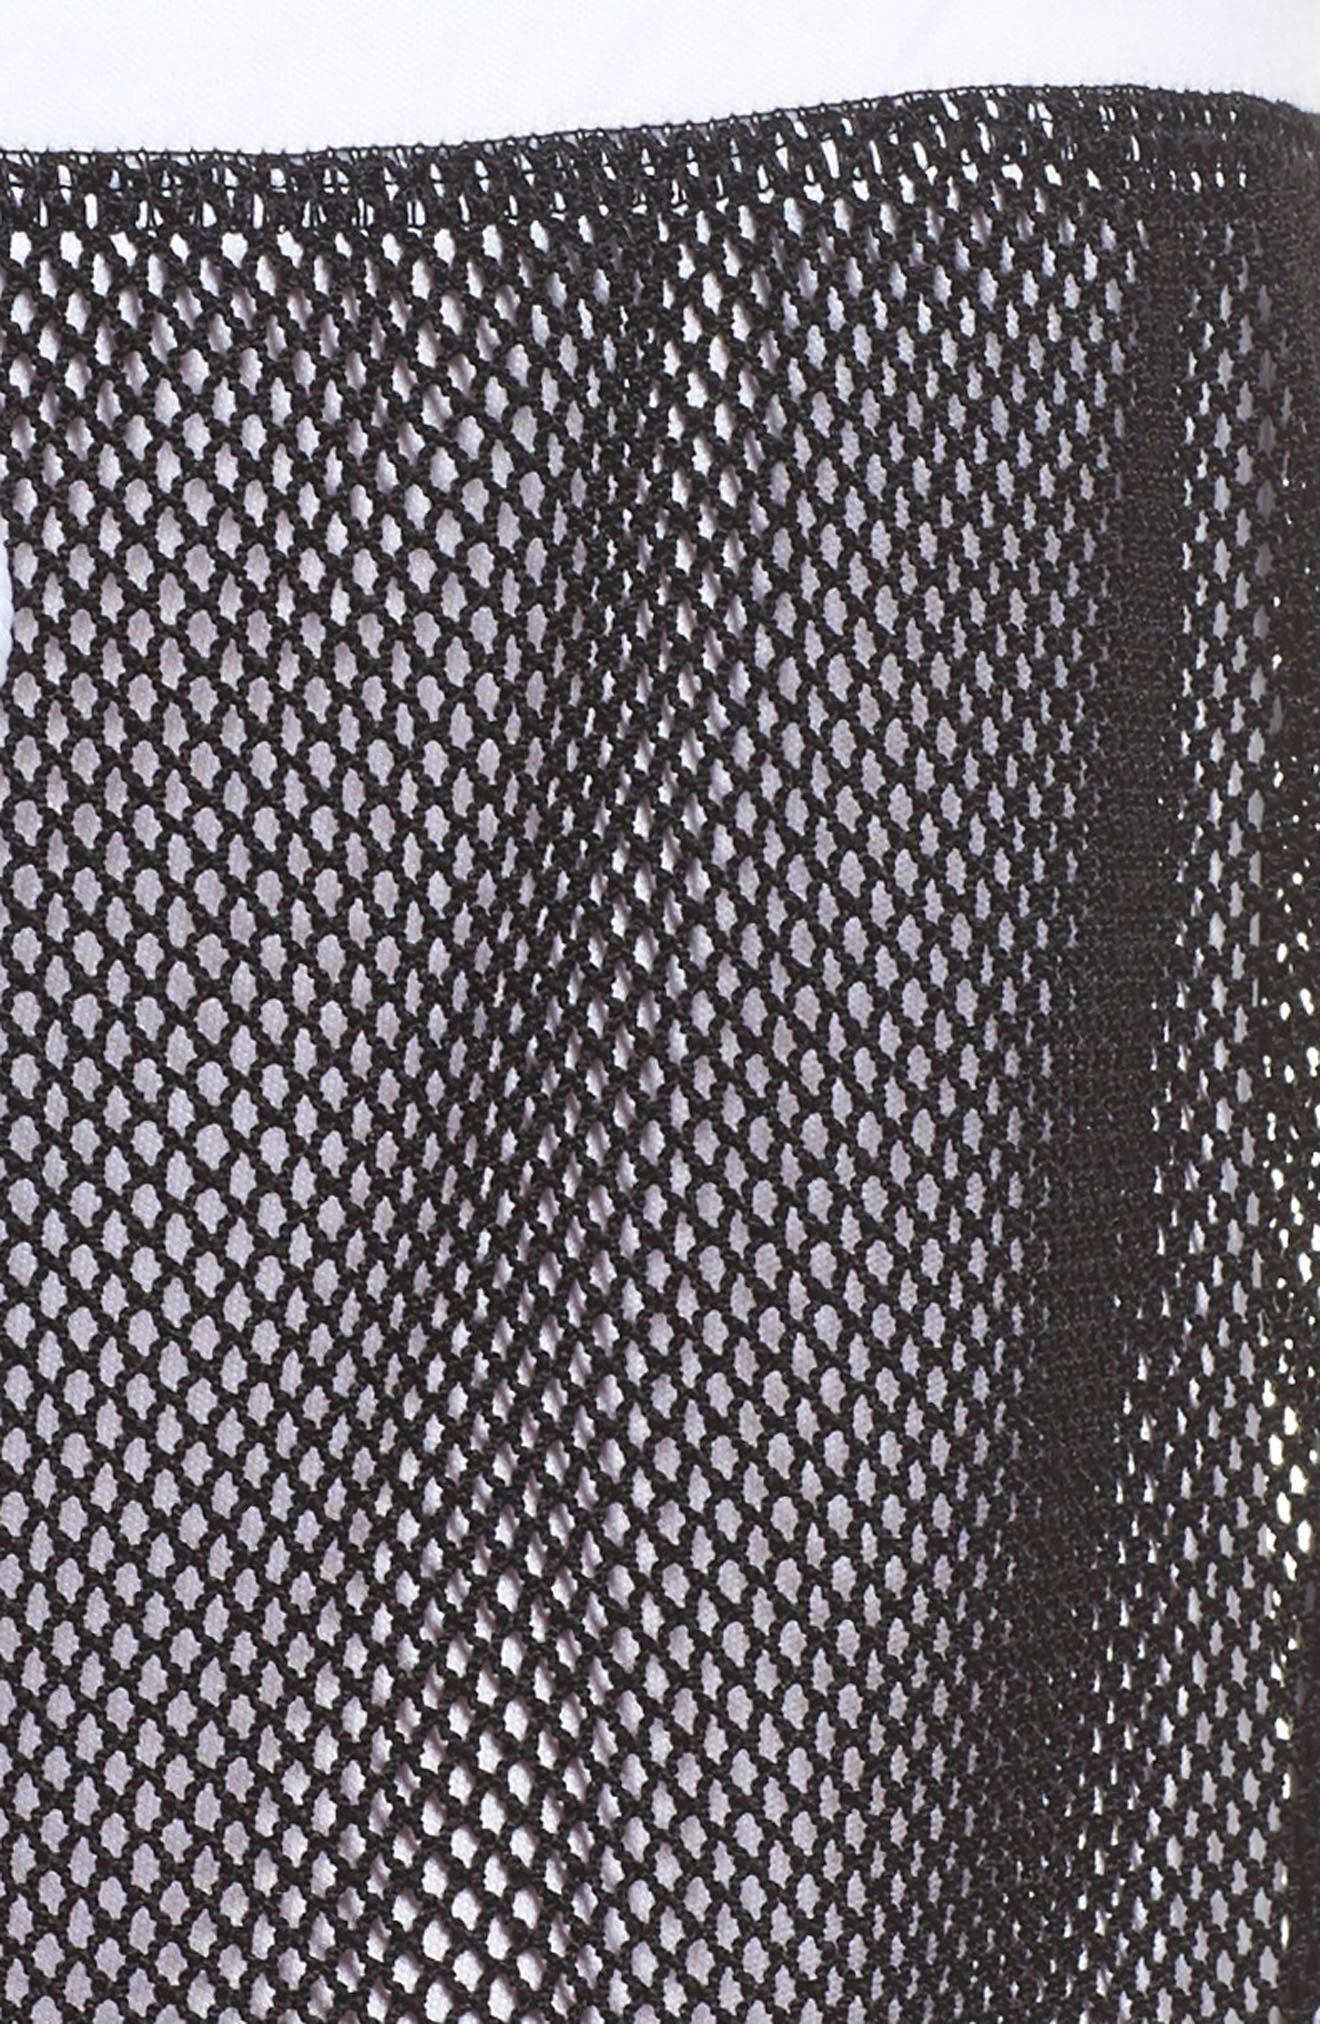 Mesh 2-in-1 Mesh Shorts,                             Alternate thumbnail 5, color,                             113